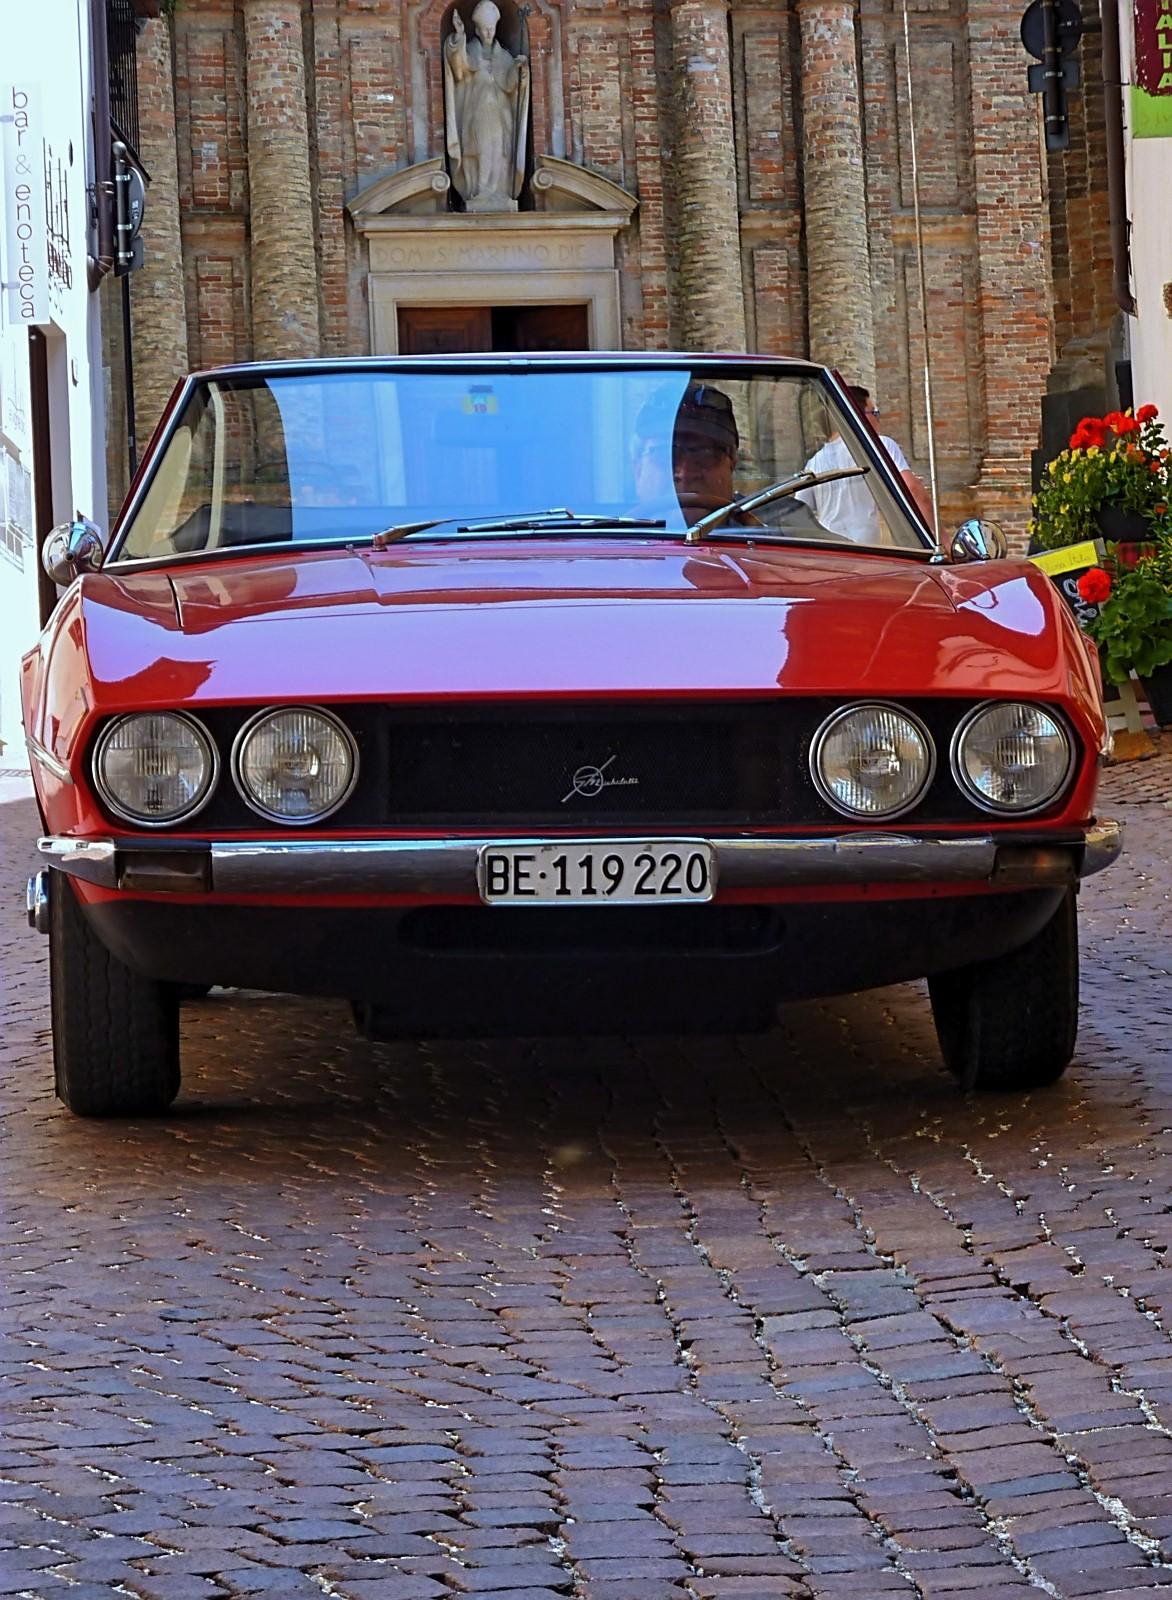 1968 Michelotti TR5 Ginevra Prototype (61)